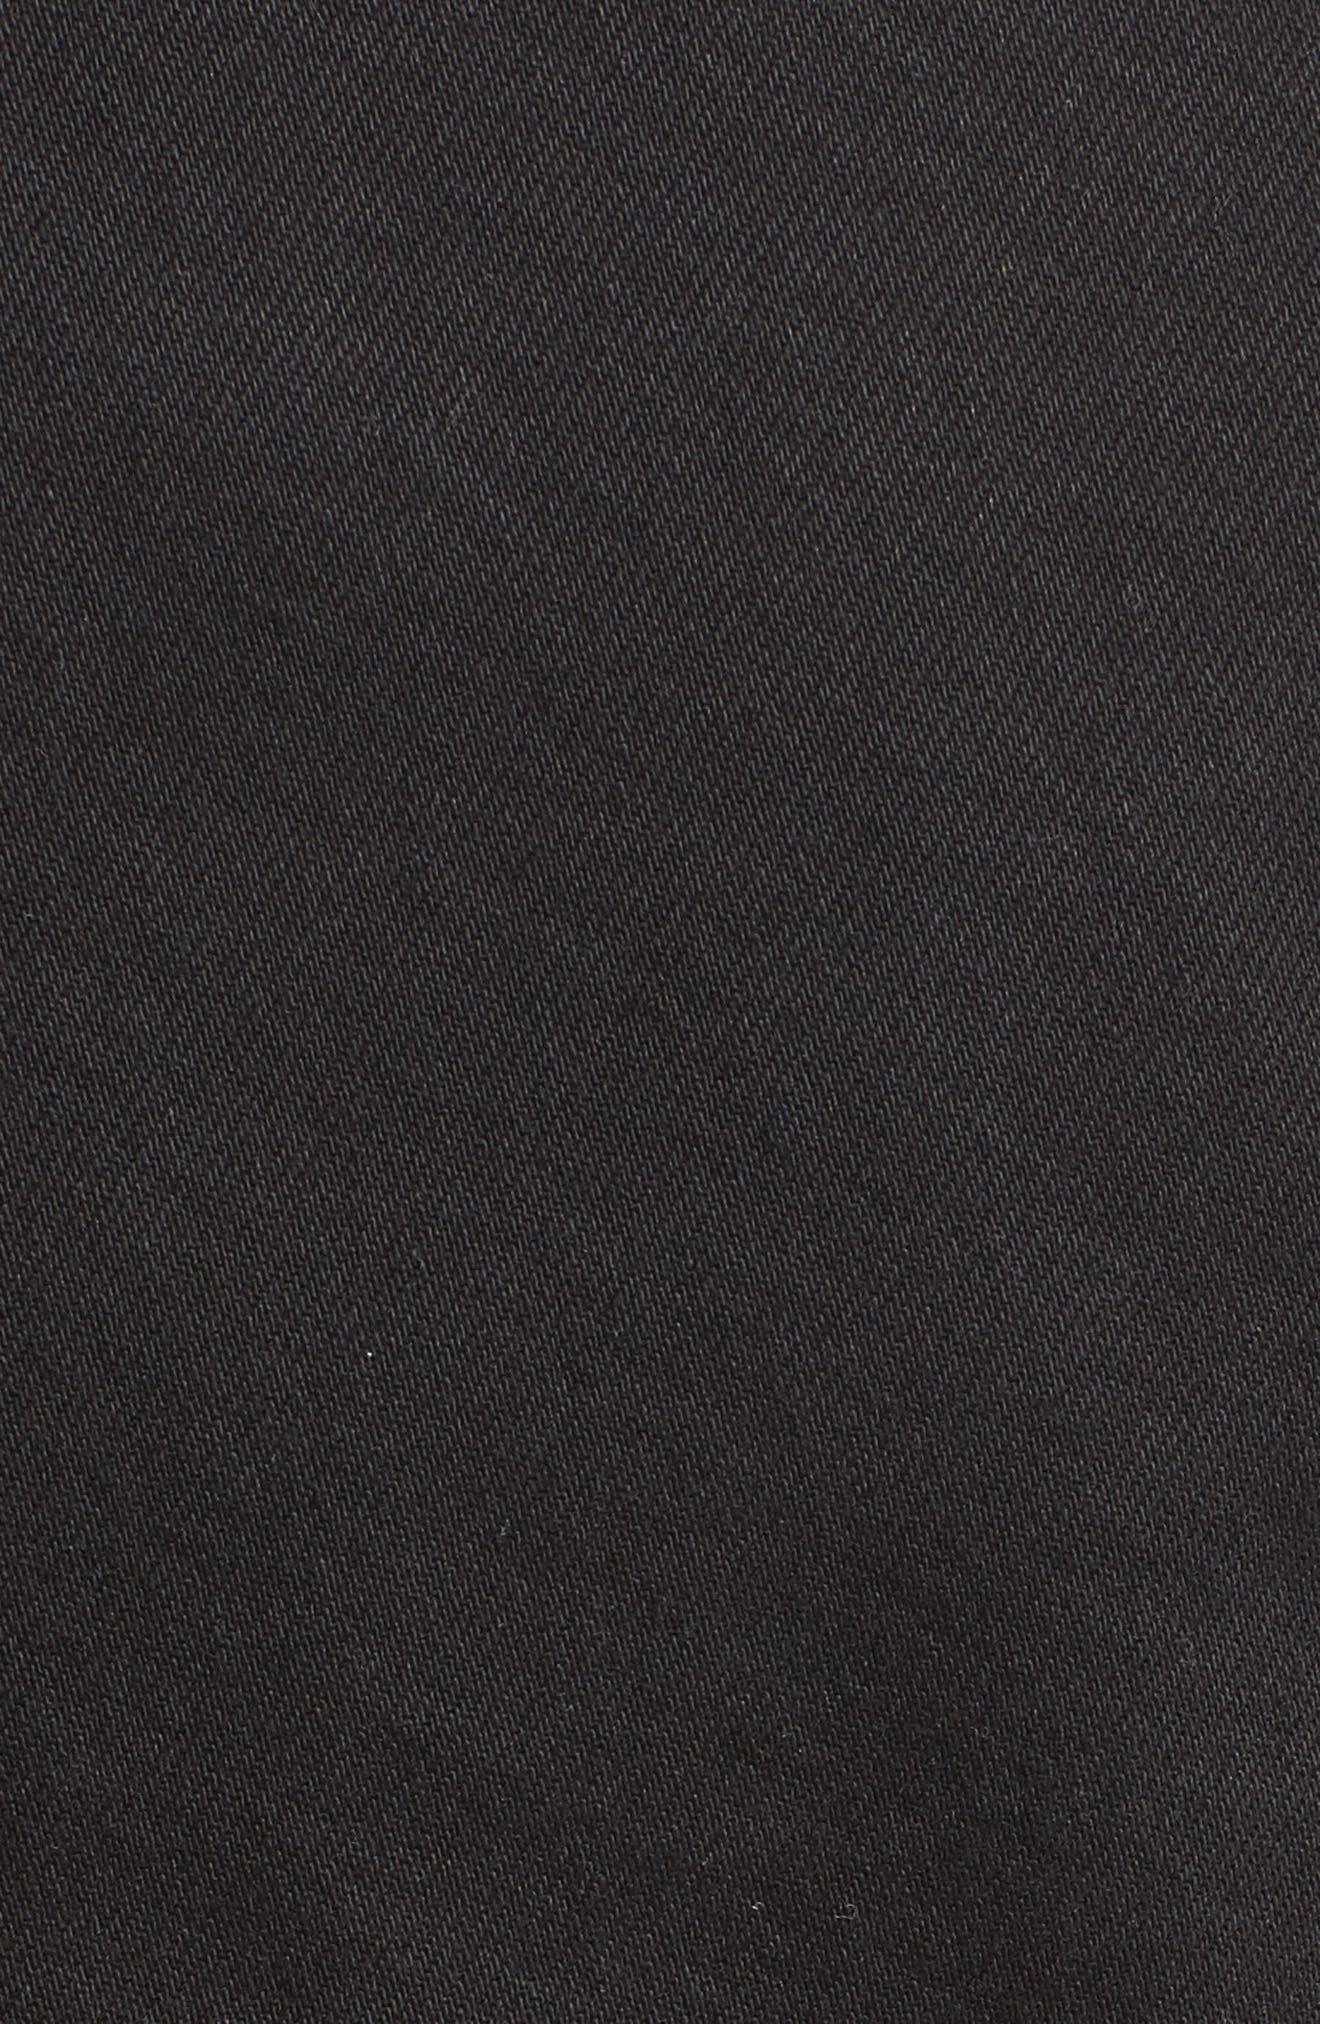 Peplum Denim Jacket,                             Alternate thumbnail 6, color,                             001